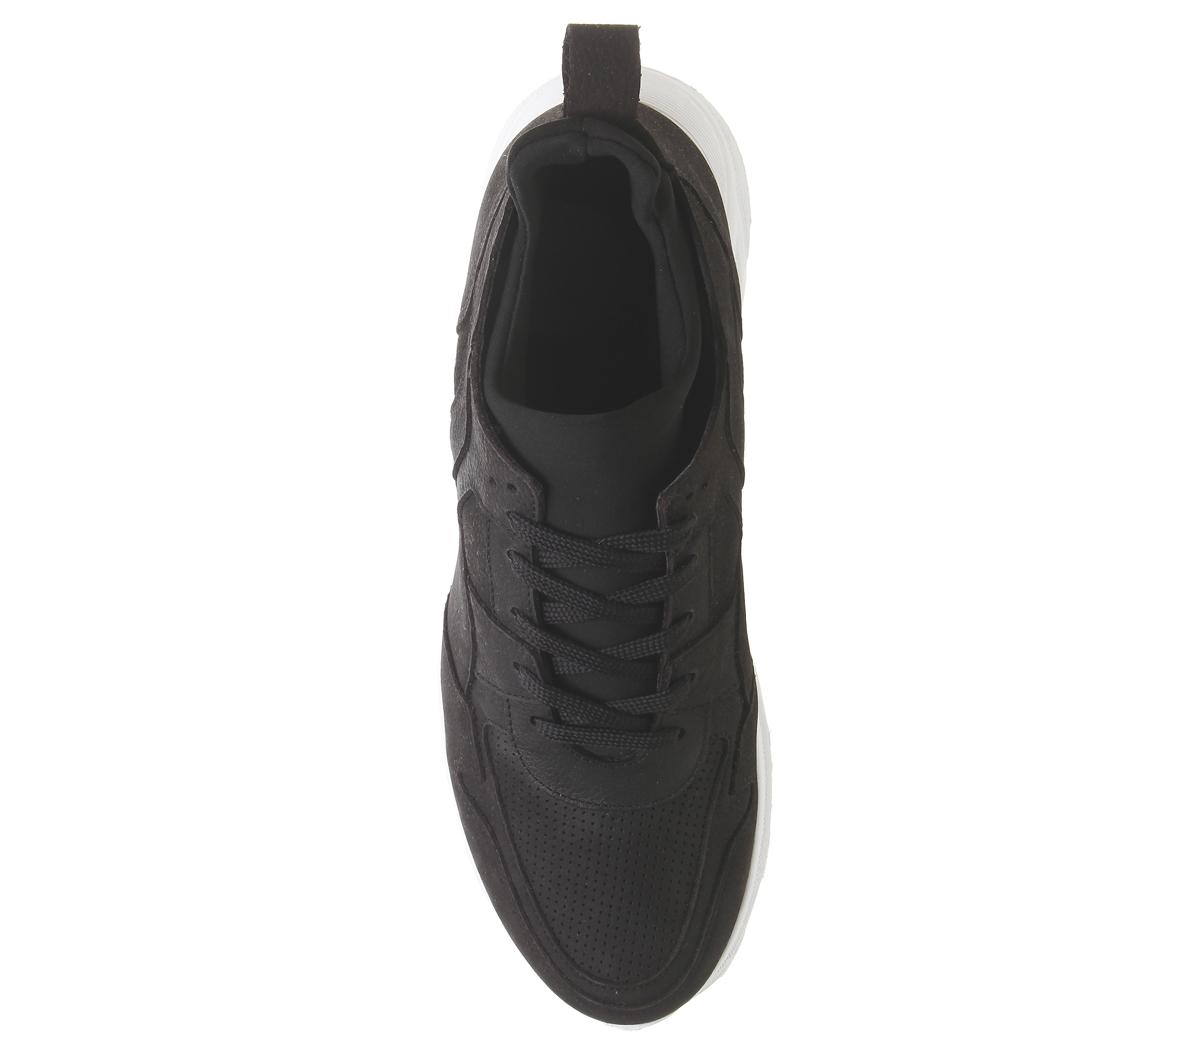 Mens-Office-Lacrosse-Trainers-Black-Nubuck-Casual-Shoes thumbnail 10